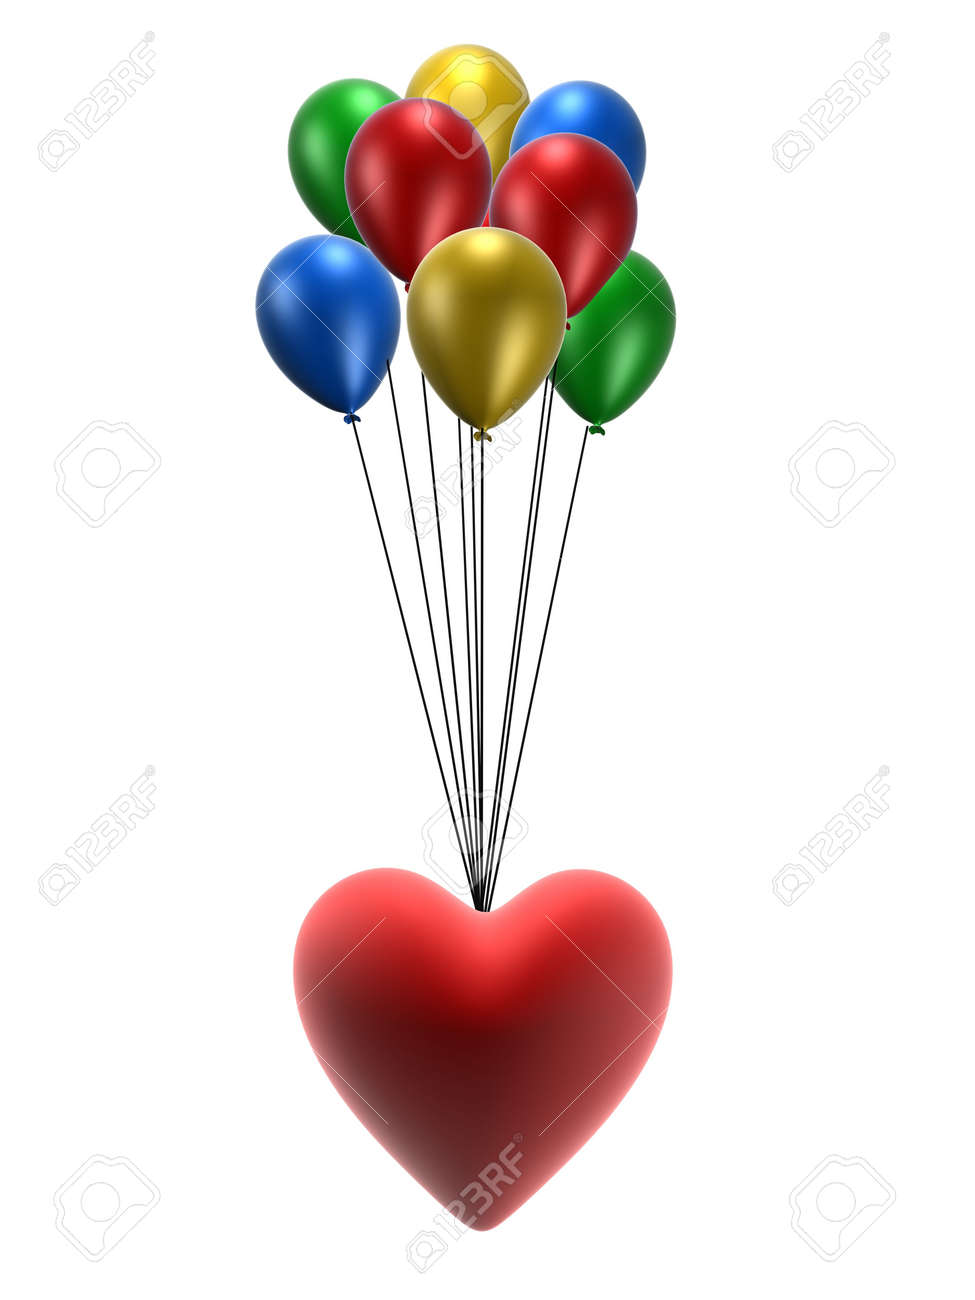 heart and balloons Stock Photo - 748885